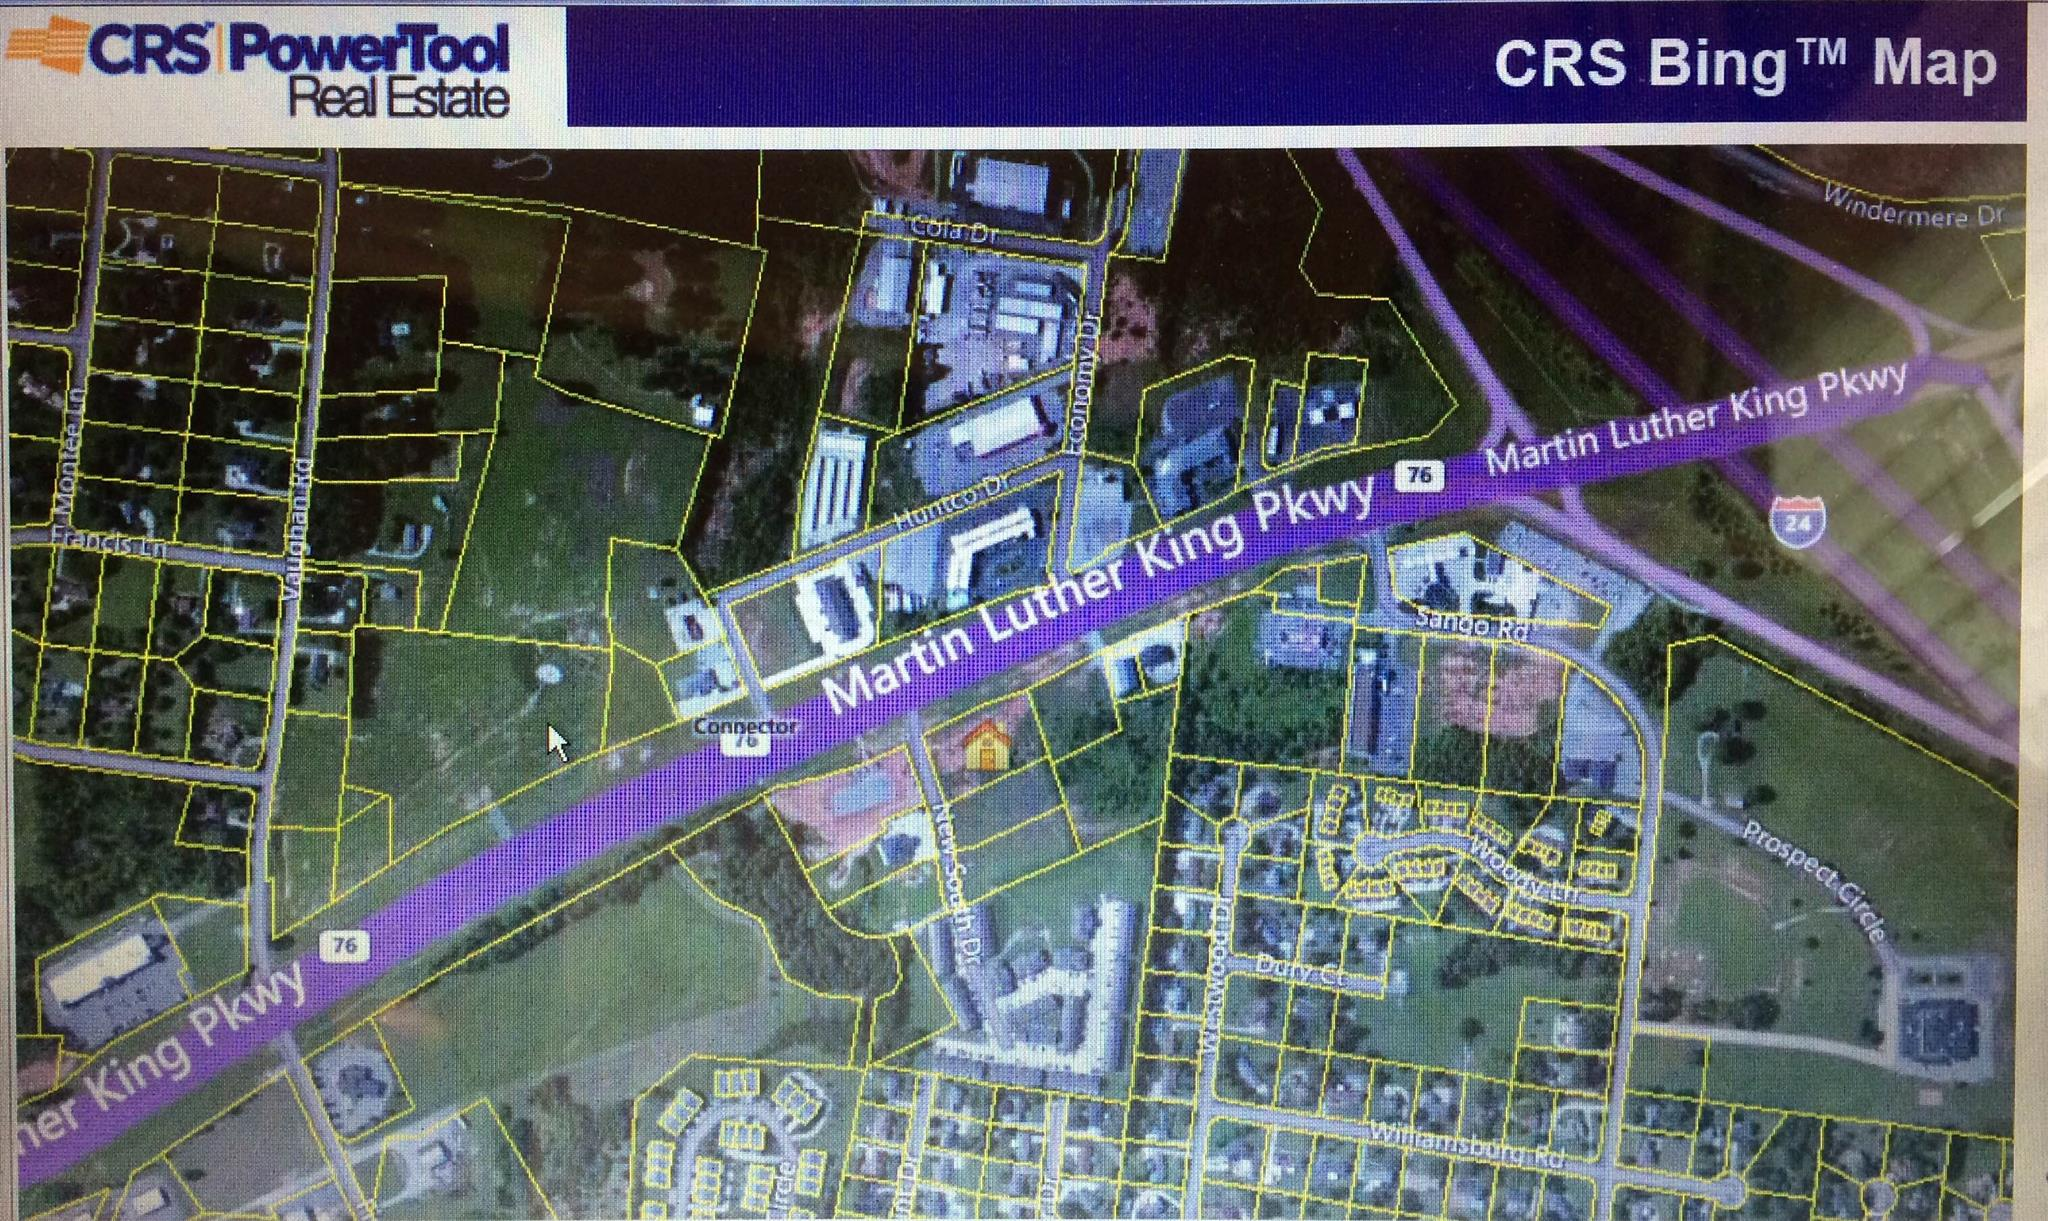 1021 Highway 76 (MLK Parkway), Clarksville, TN 37043 - Clarksville, TN real estate listing